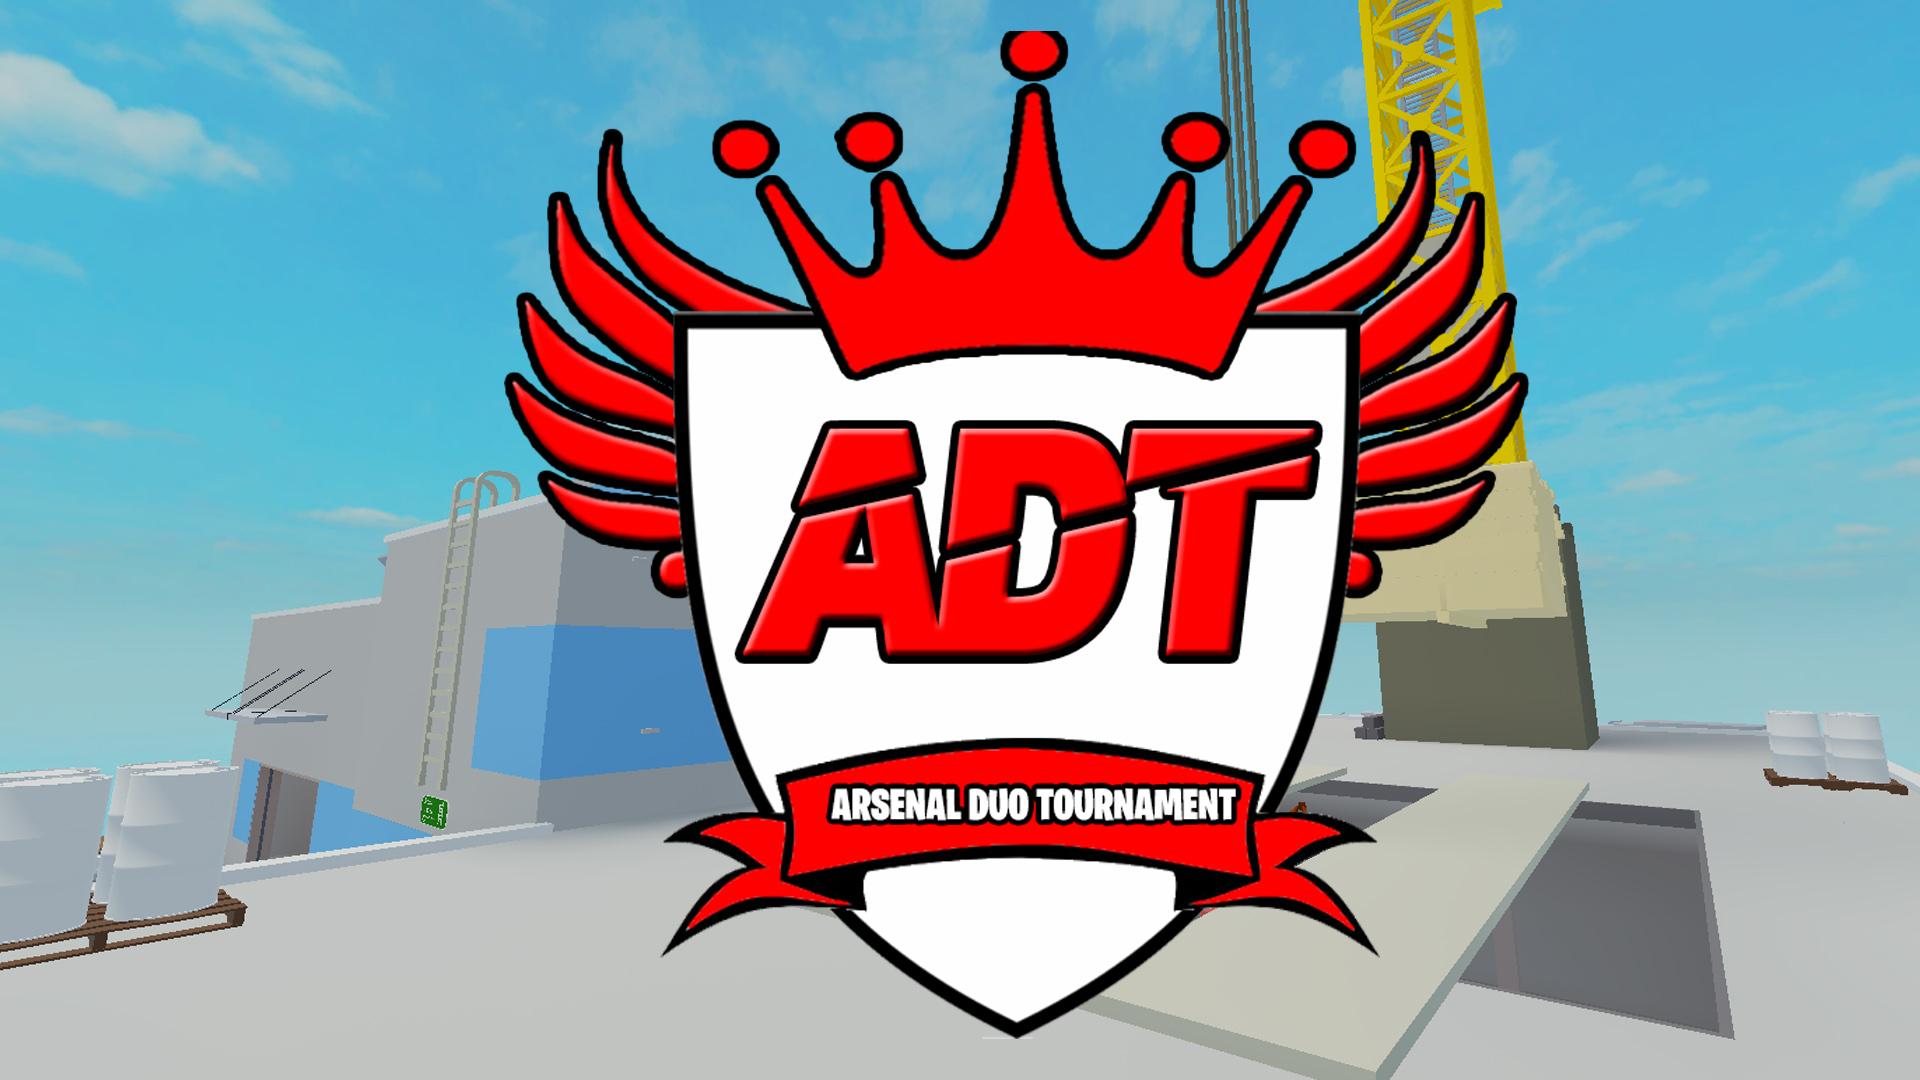 roblox arsenal duo tournament season